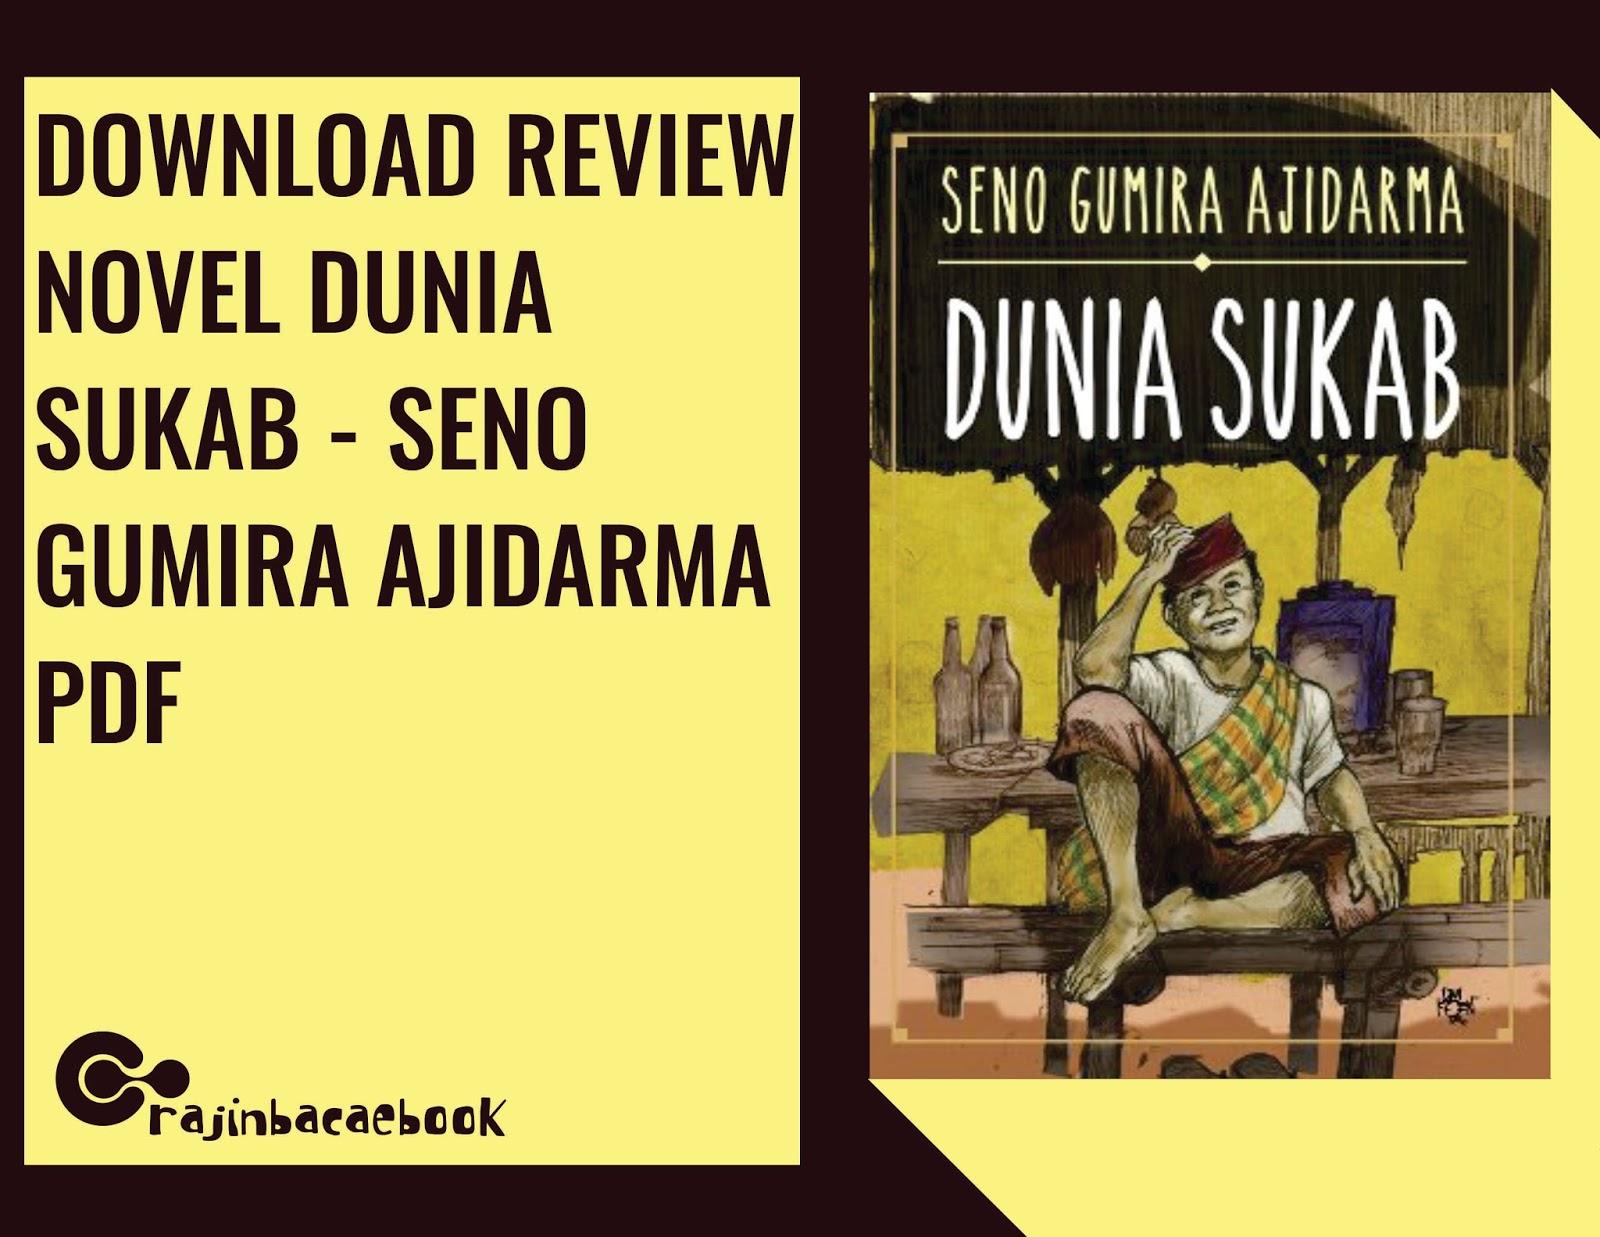 Baca novel online free-7216